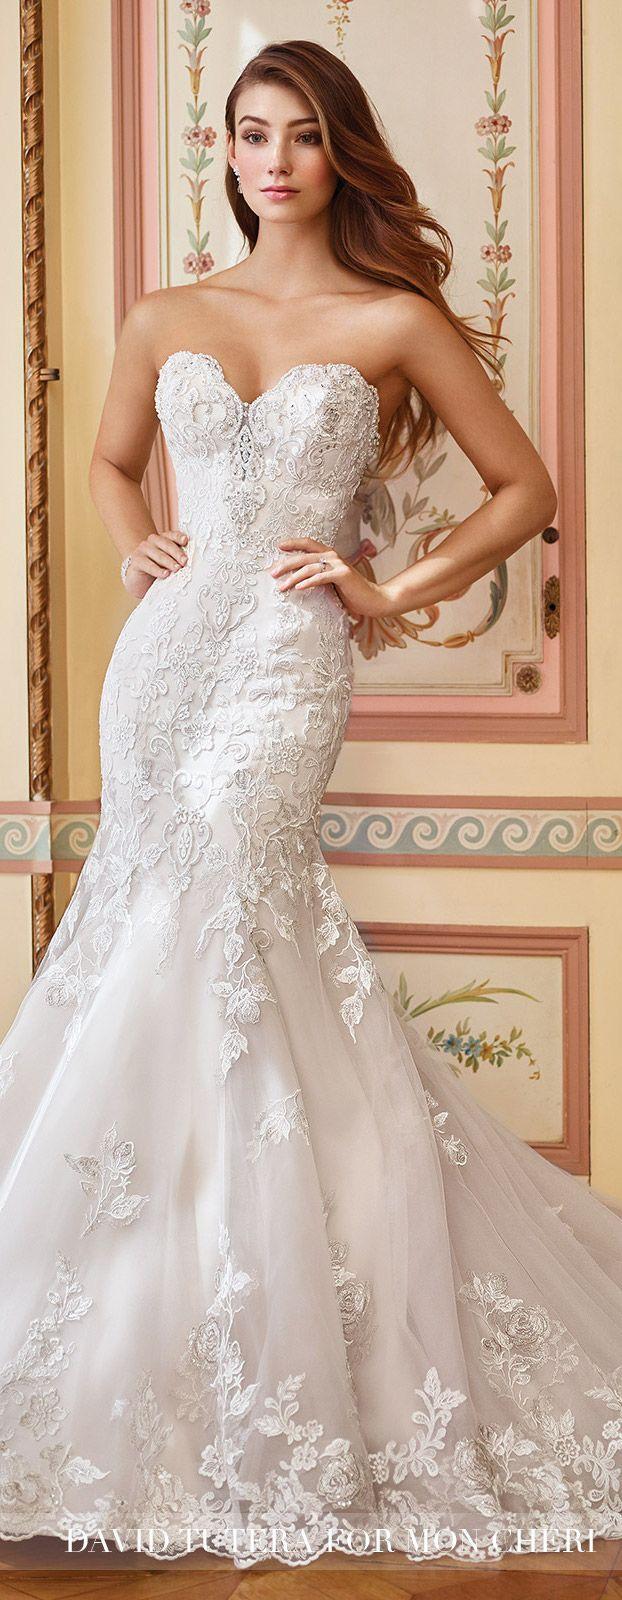 Wedding Dress by David Tutera for Mon Cheri | Style No. » 117284 Danae